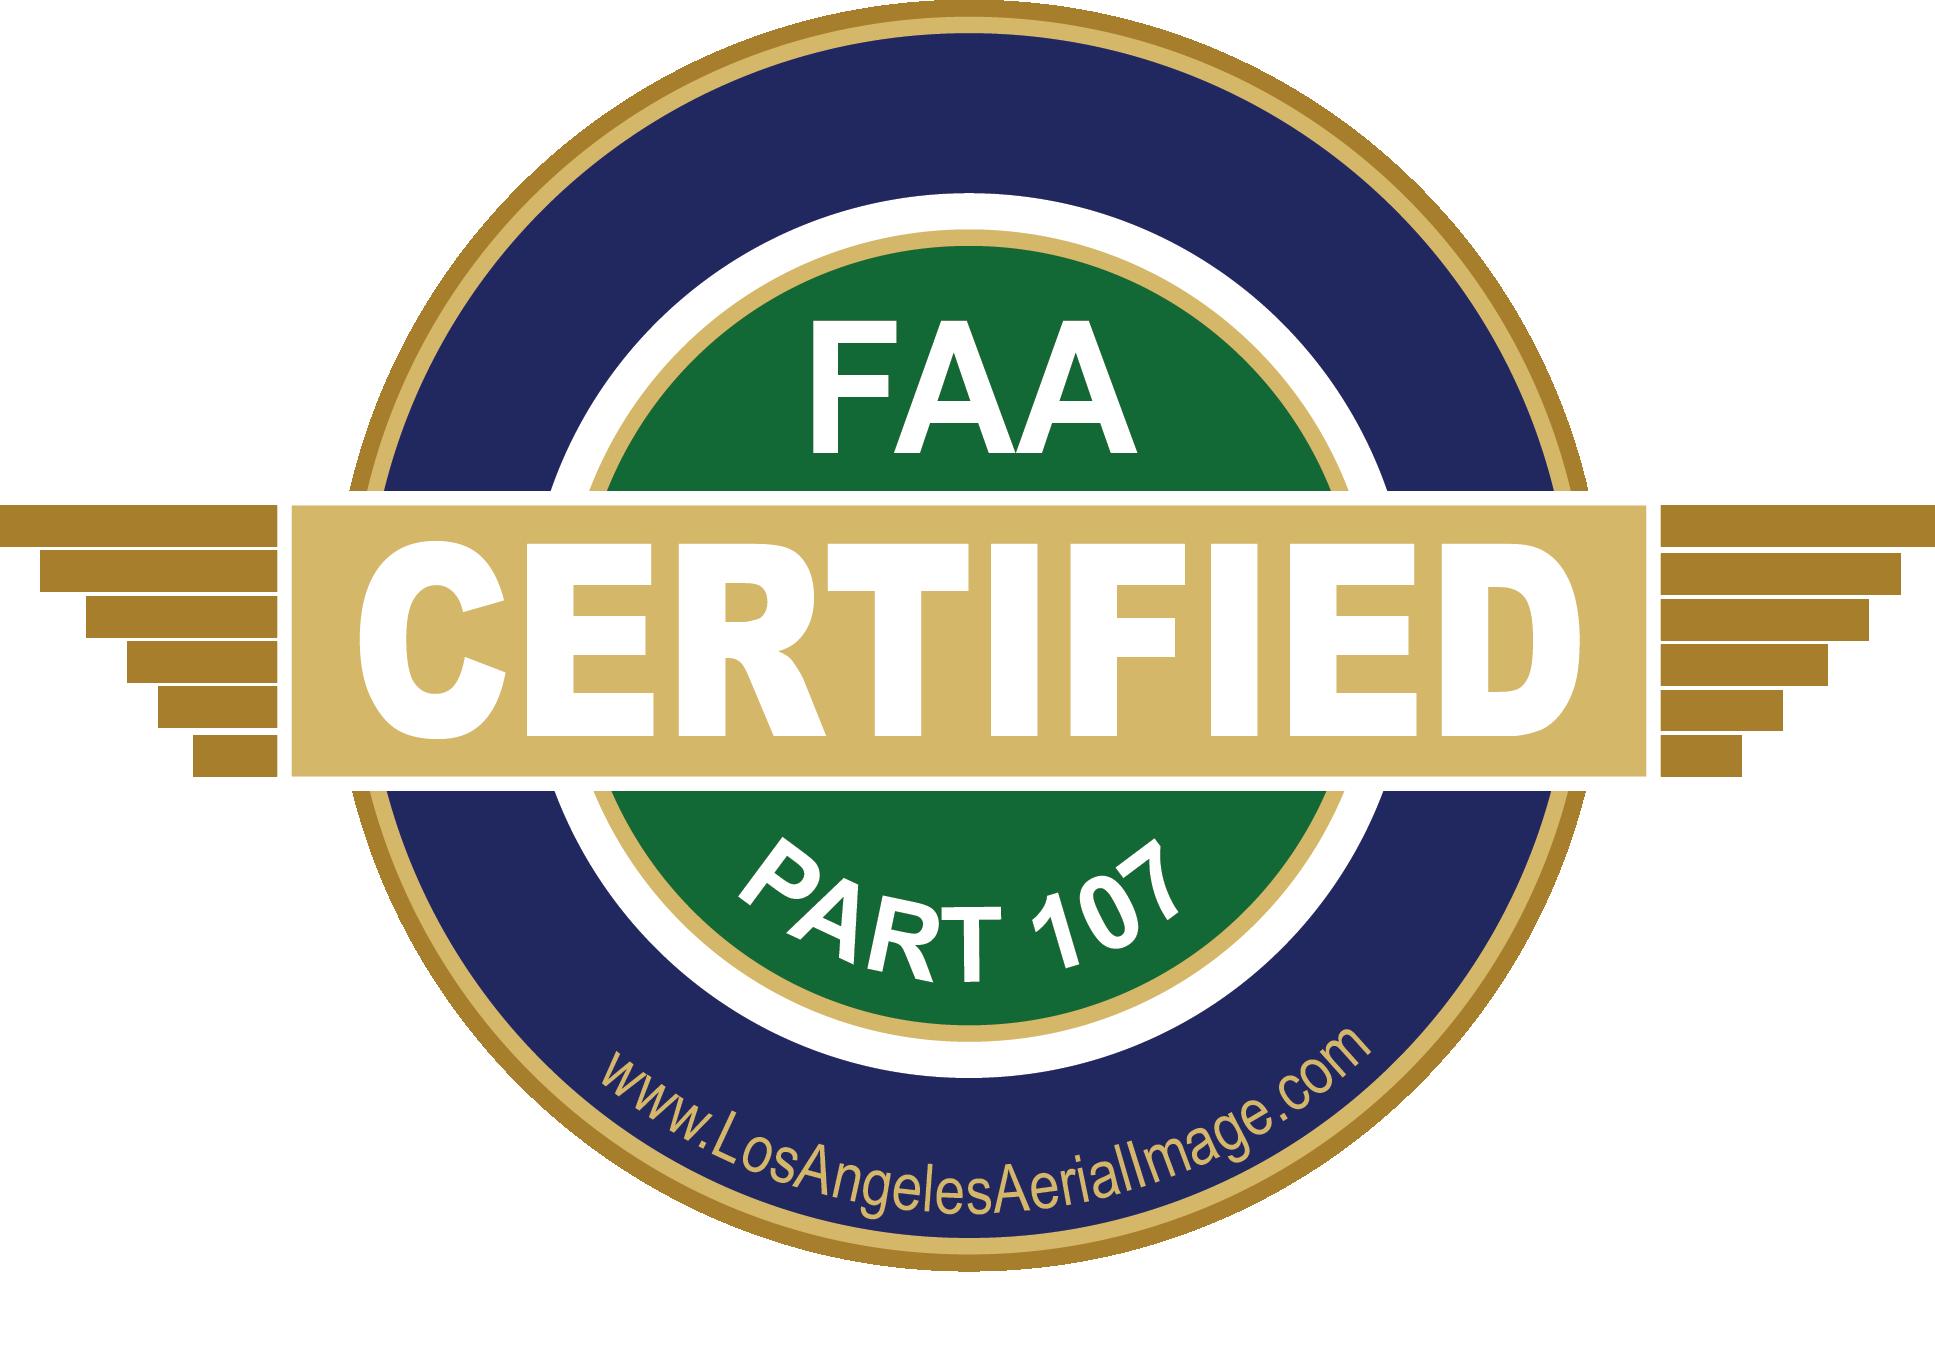 LA Aerial Image FAA Part 107 Certified